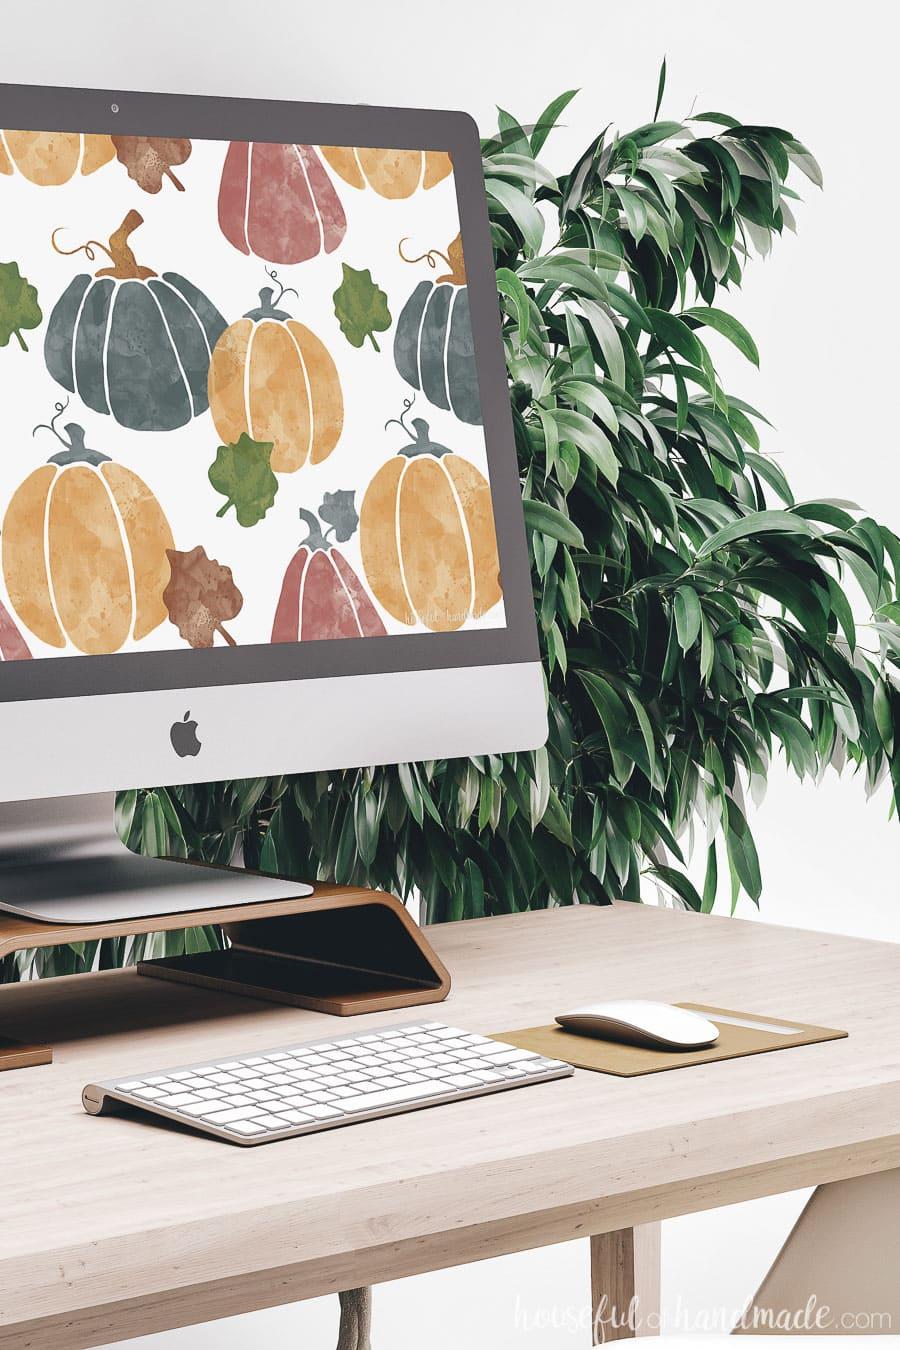 Desktop computer with watercolor pumpkin digital wallpaper design on the background.